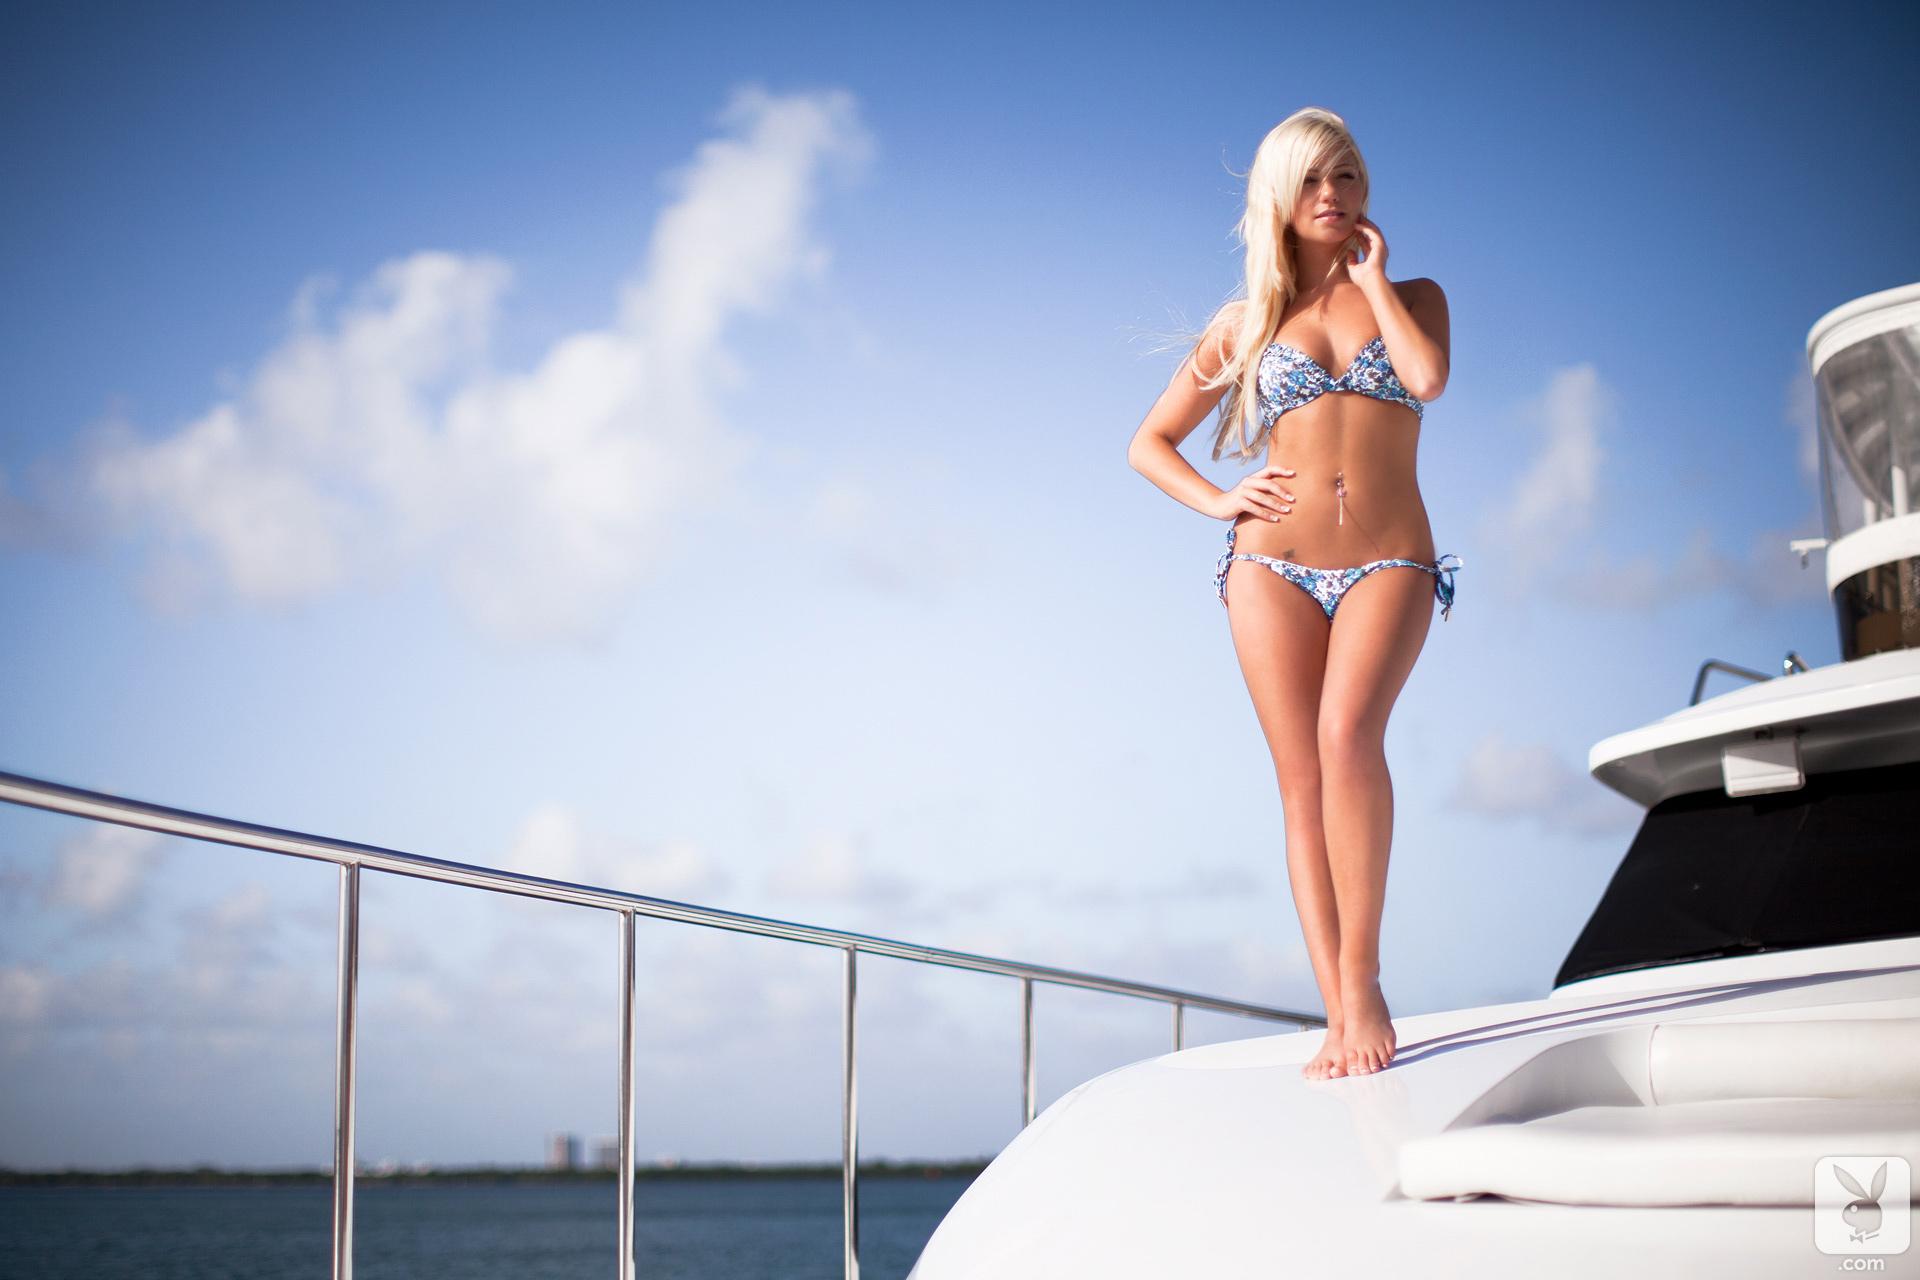 kyndra-mcgaw-boat-bikini-playboy-01